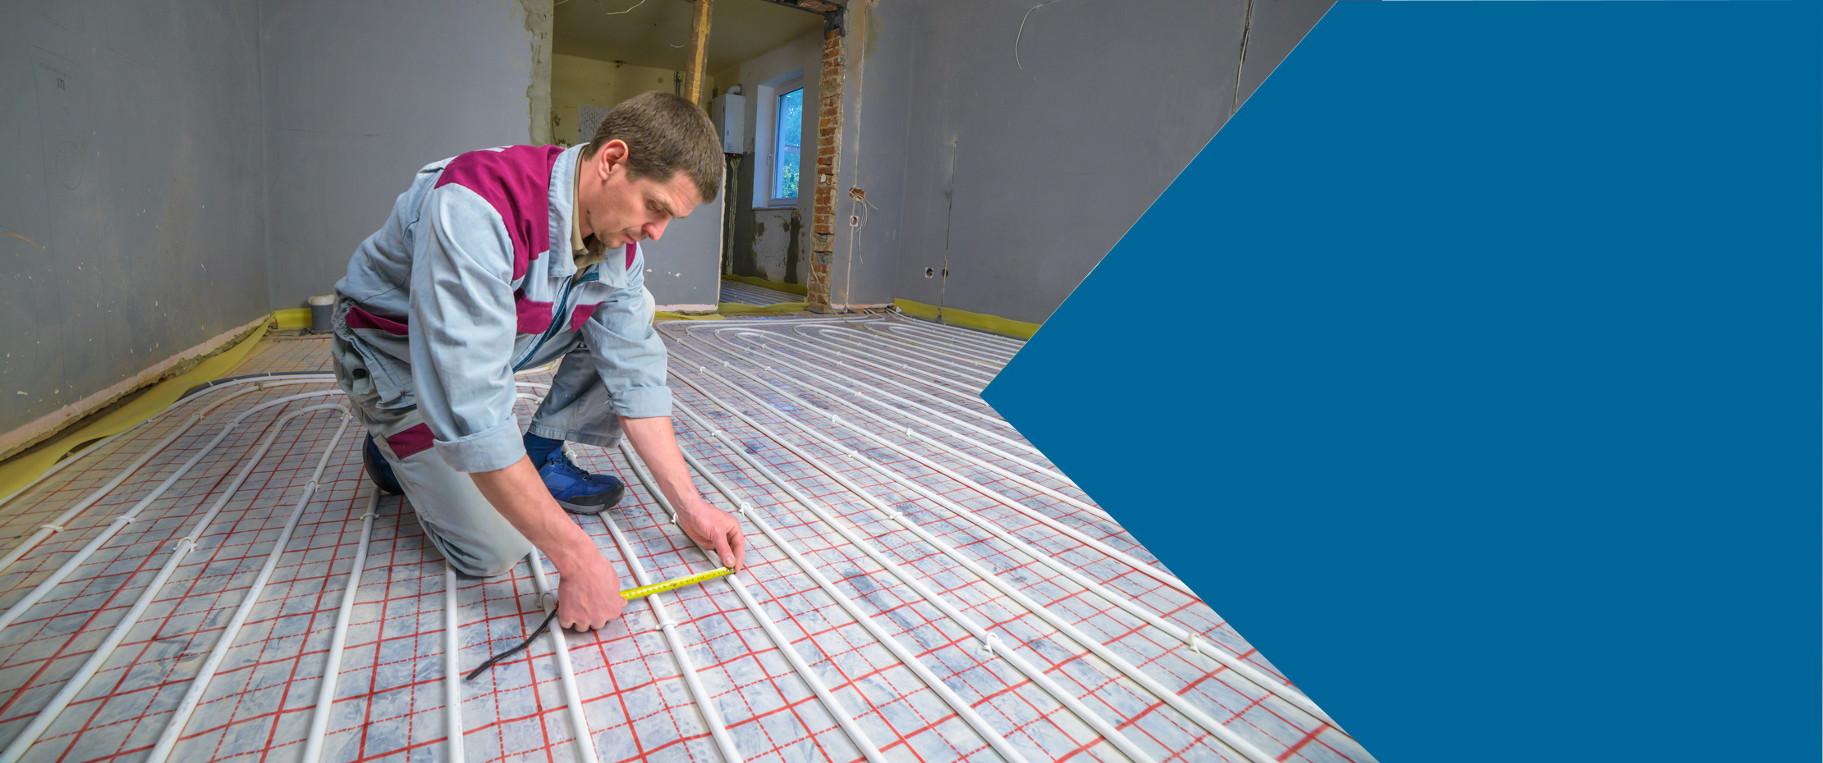 Fußbodenheizung HDG Installationstechnik